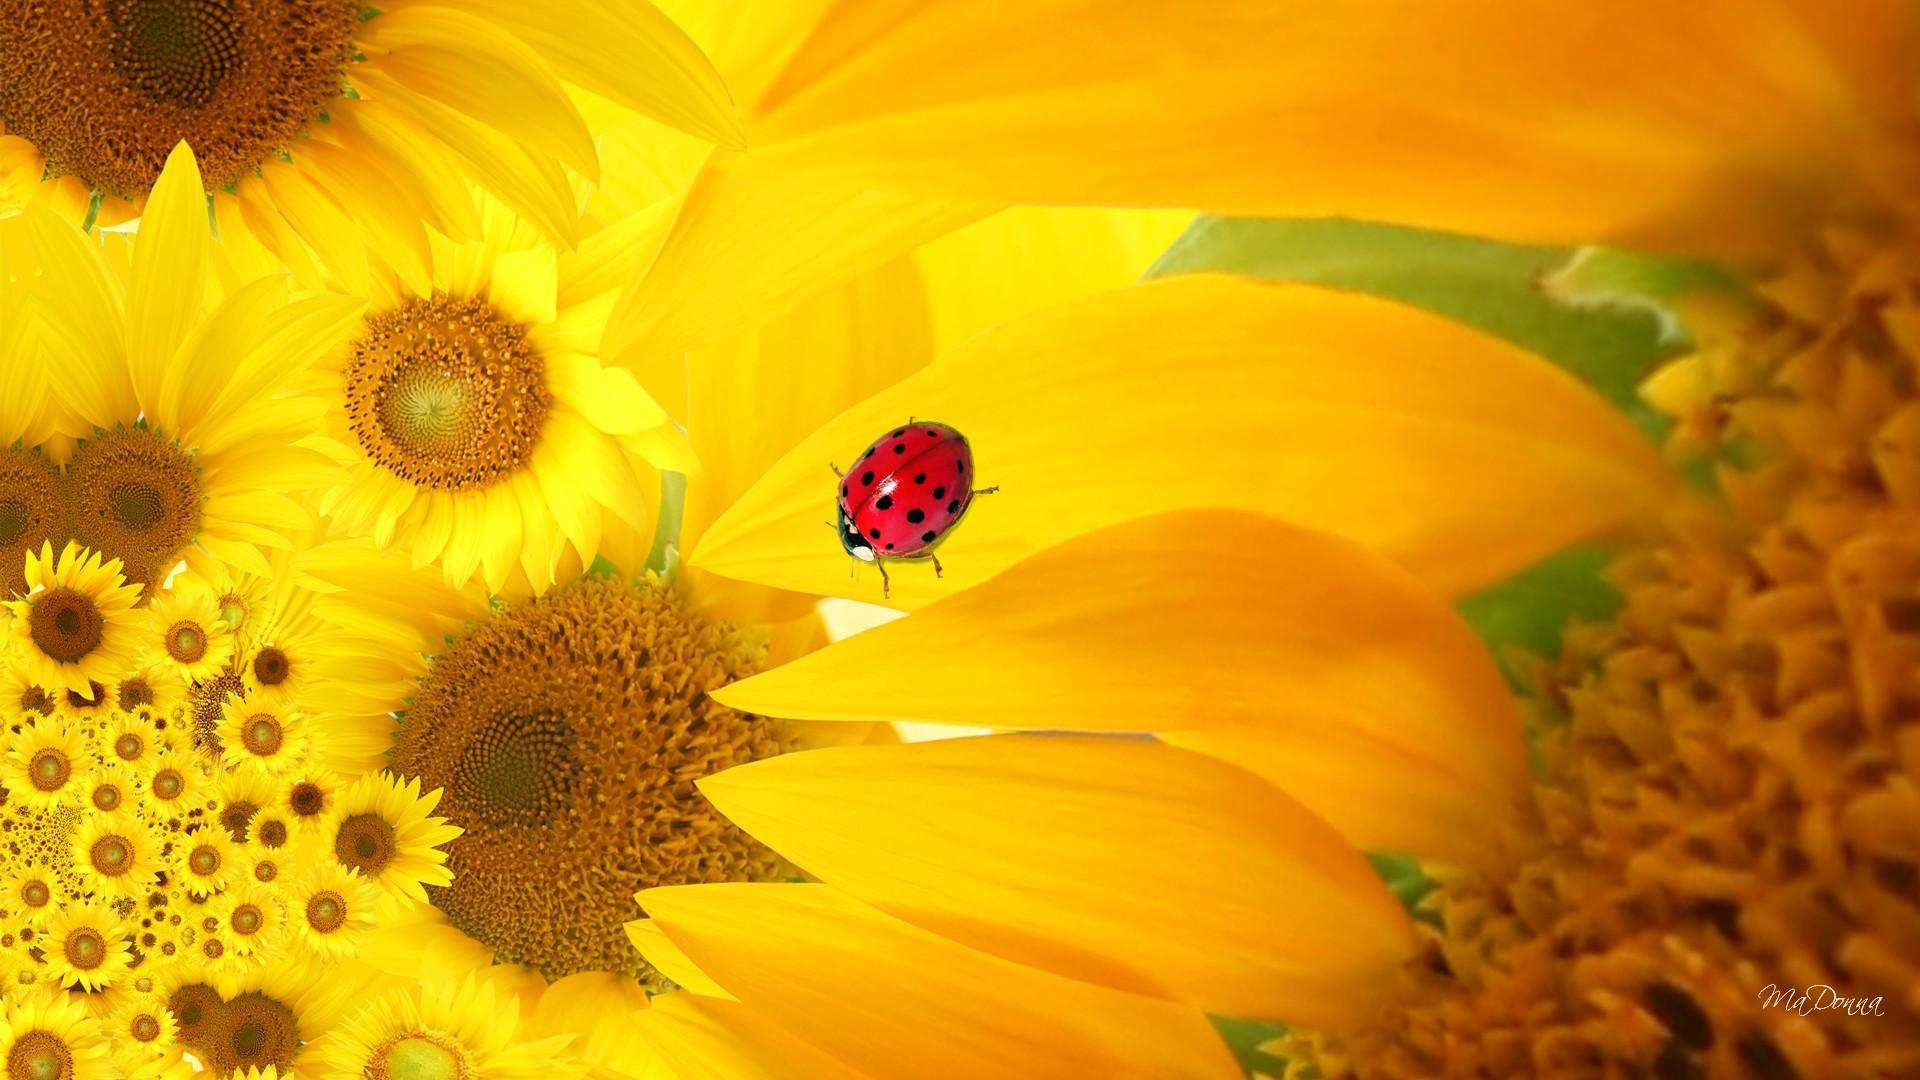 Iphone X Moving Wallpaper From Commercial Sunflower Ladybug Hd Desktop Wallpaper Widescreen High